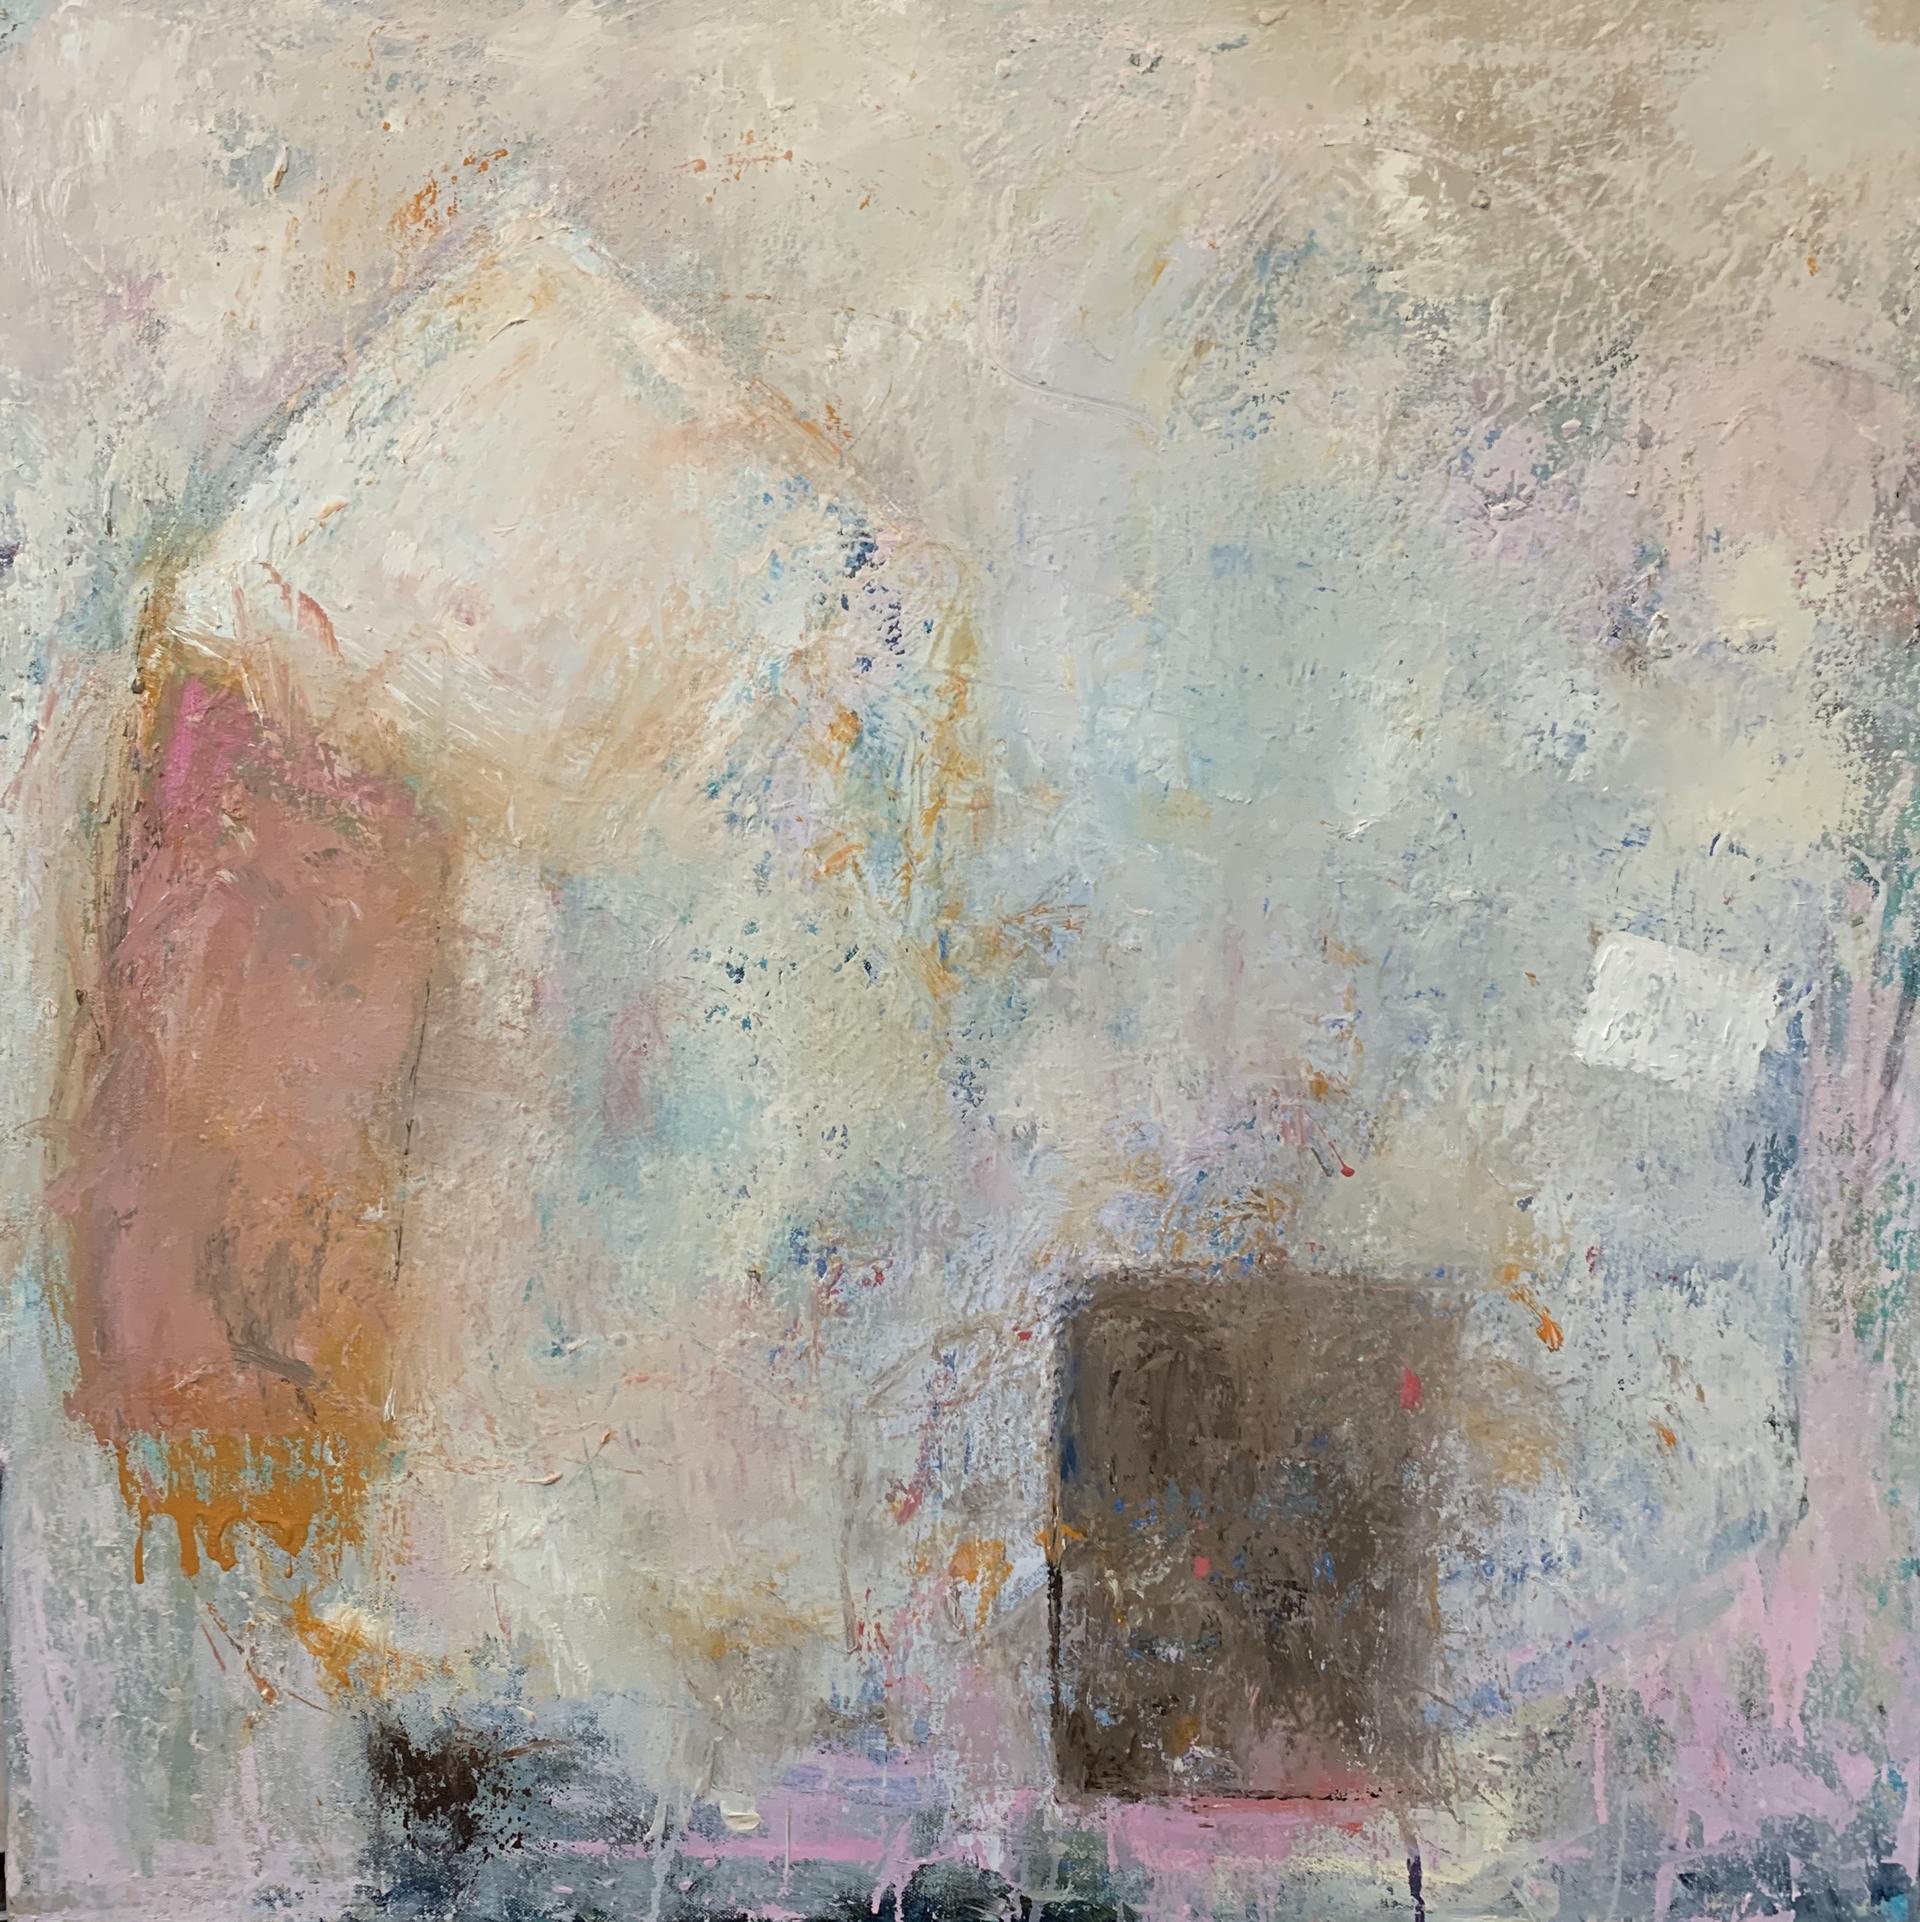 Feather Burst by Alicia Gitlitz